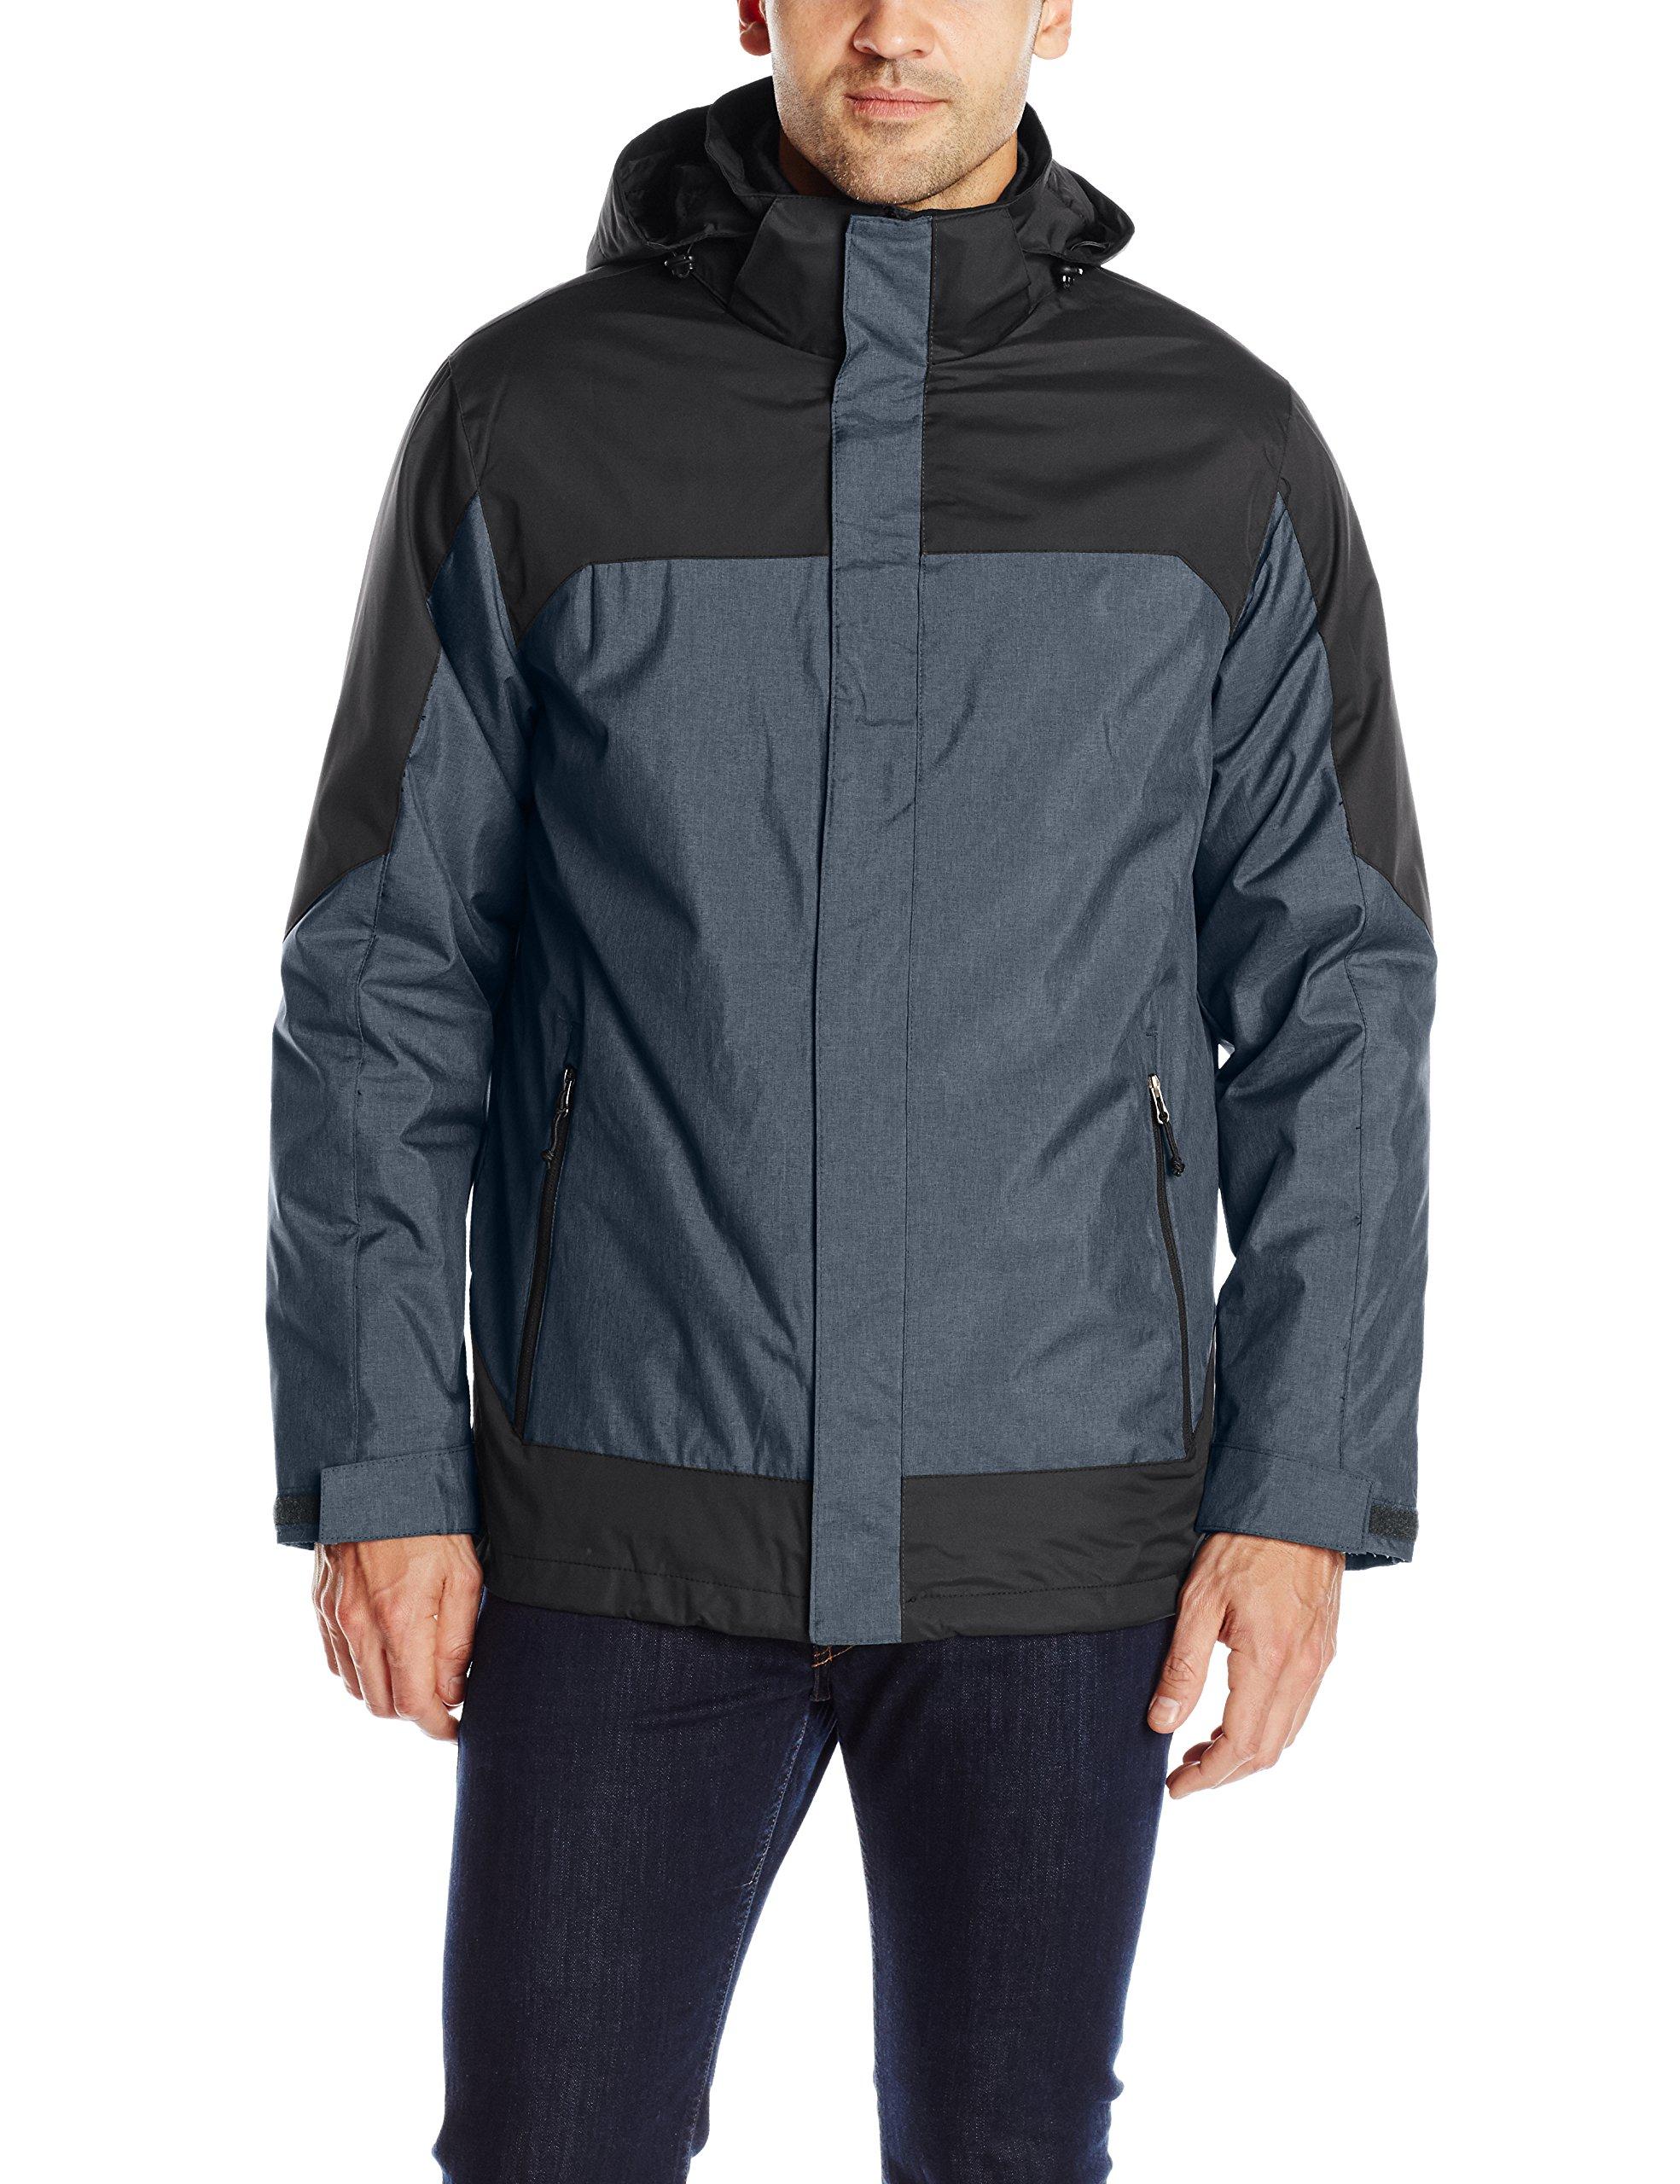 32Degrees Weatherproof Men's 3 in 1 Systems Jacket Colorblock, Navy Melange/Black, Large by 32 DEGREES